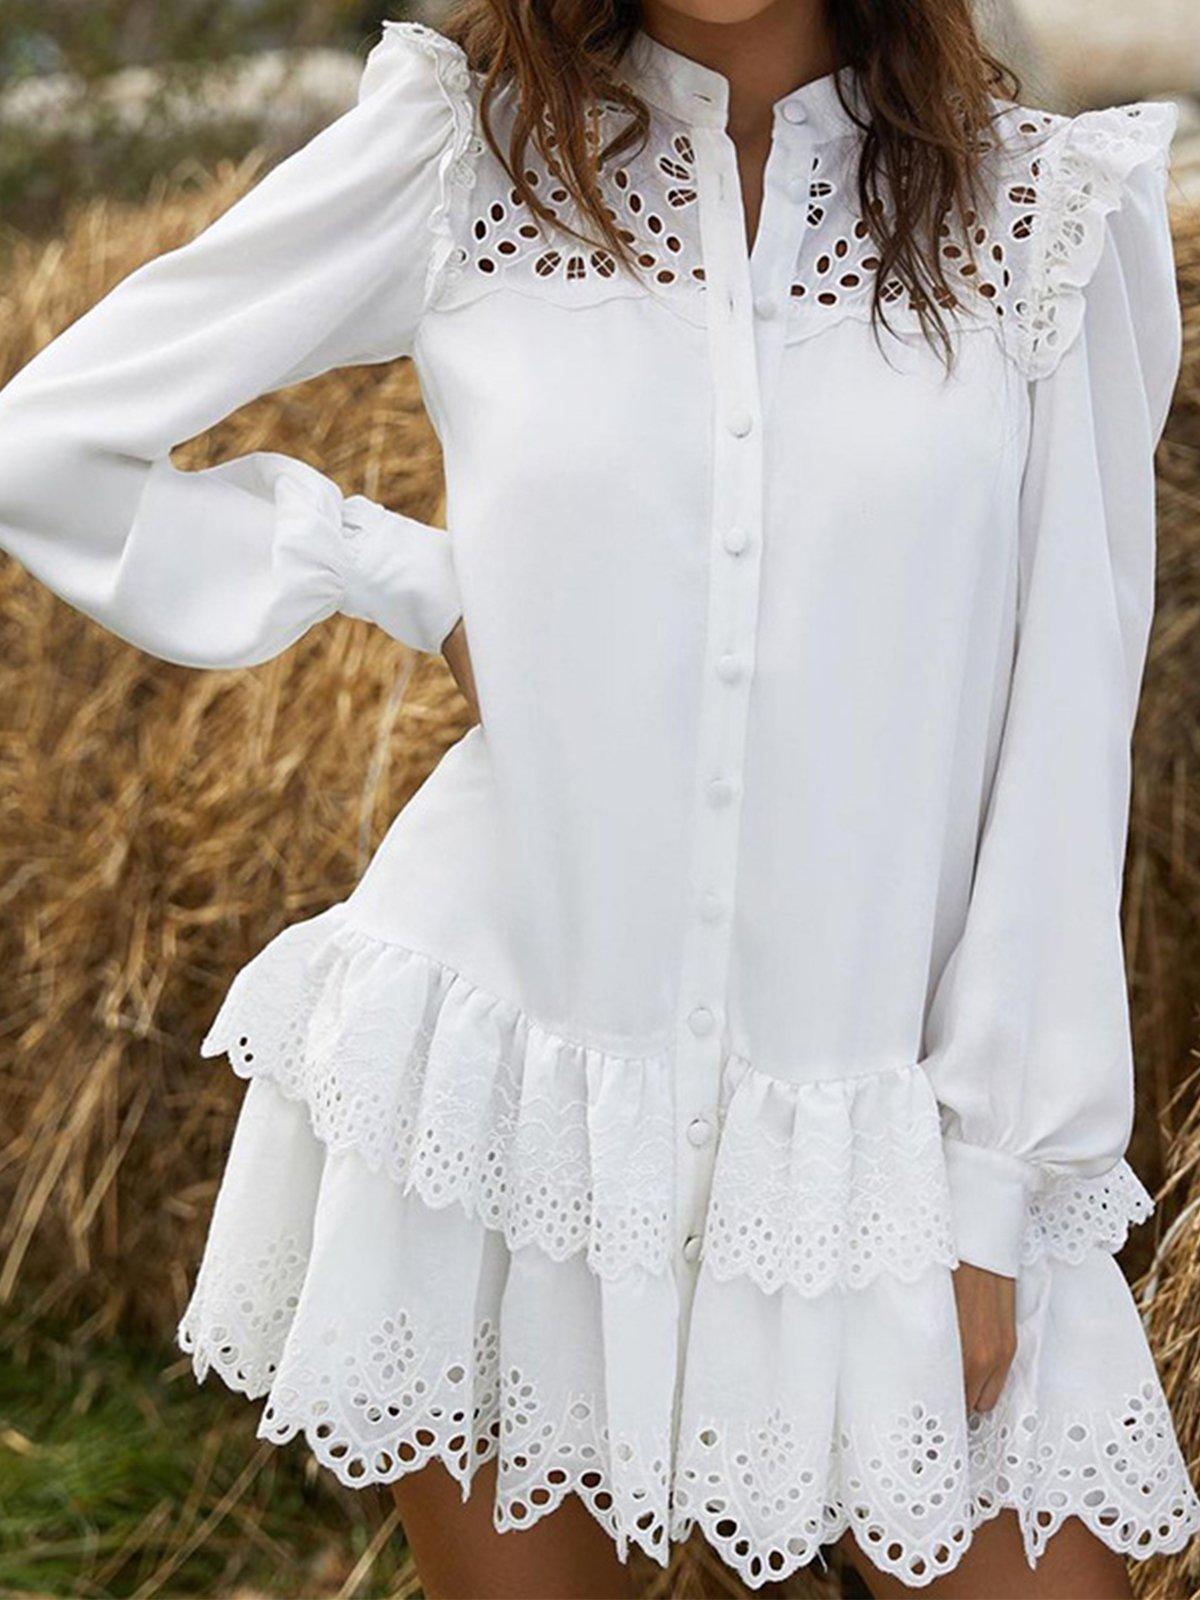 Linen White Set by Tamara Bellis